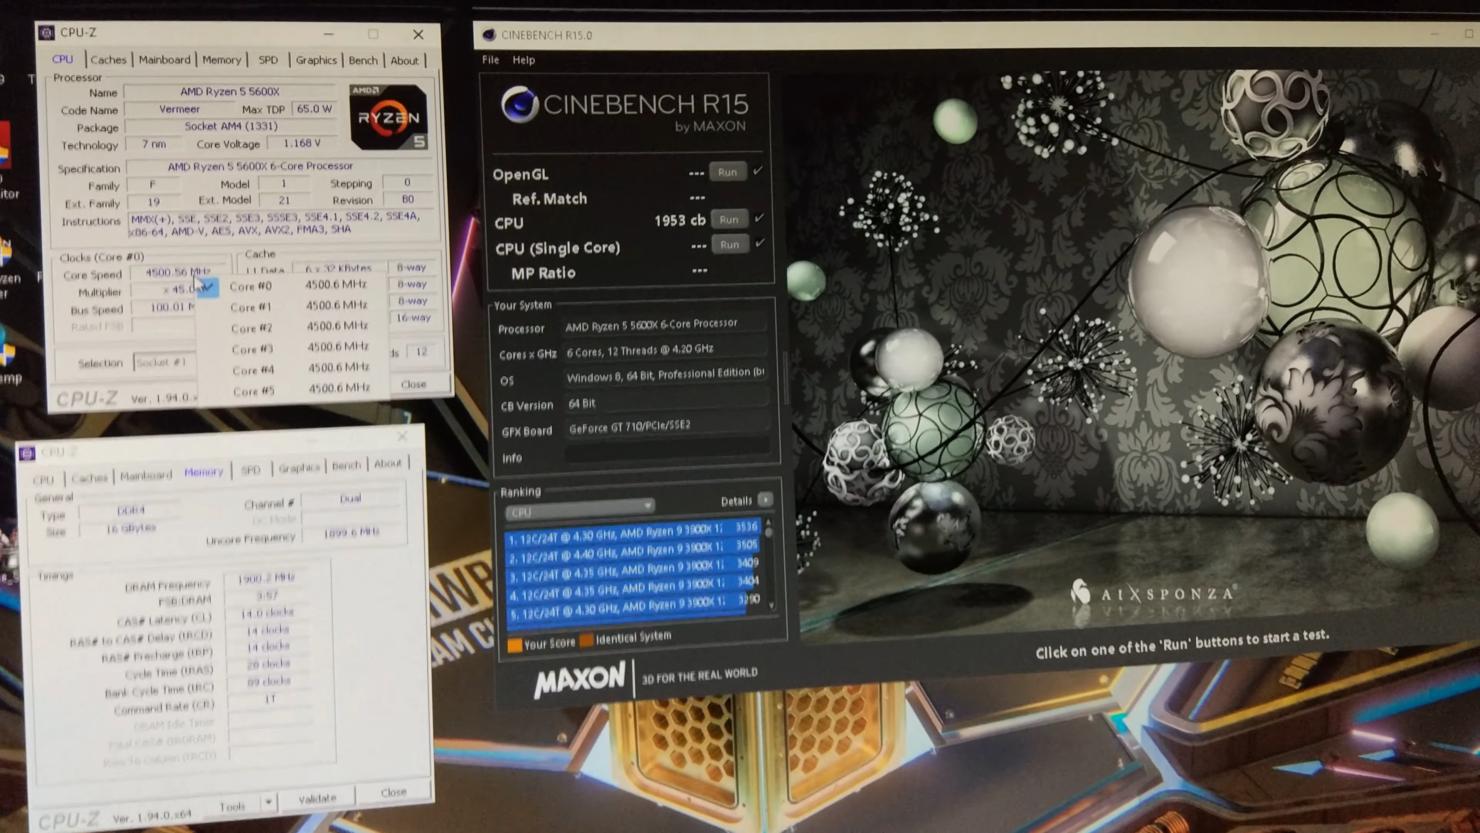 amd-ryzen-5-5600x-6-core-zen-3-cpu-benchmarks_4-5-ghz_1